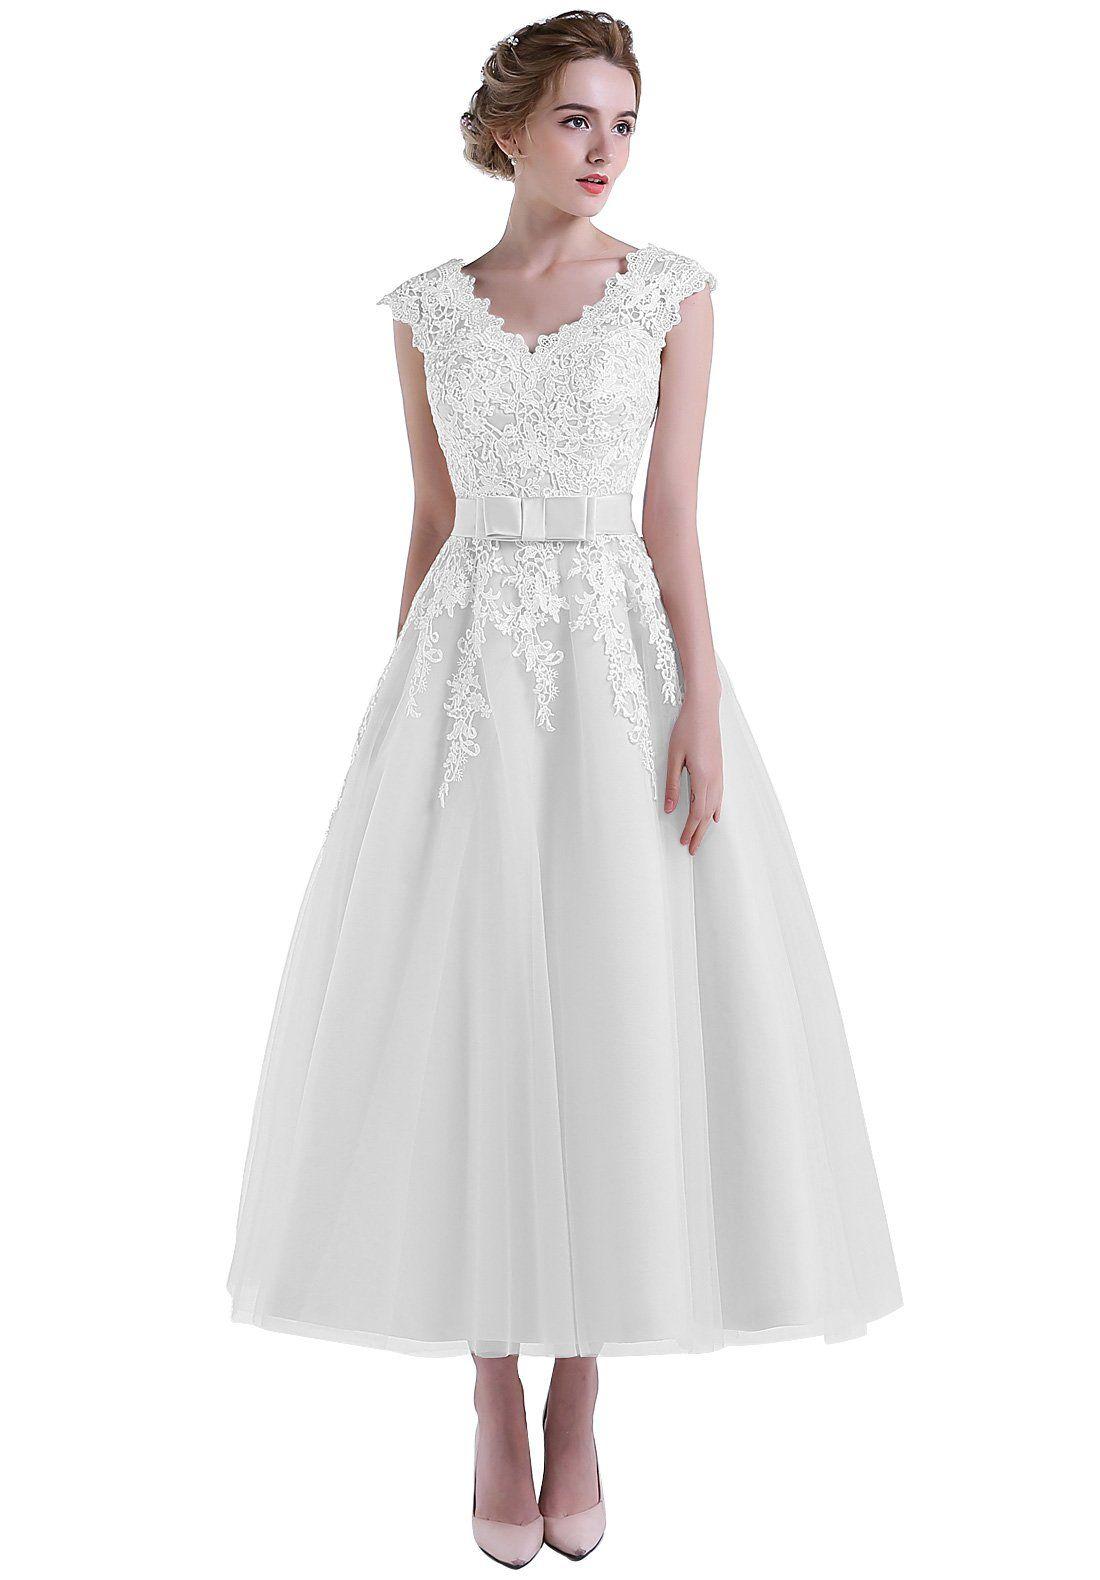 Helenebridal Beach Tea Length Lace Vneck Cap Sleeve Wedding Dress